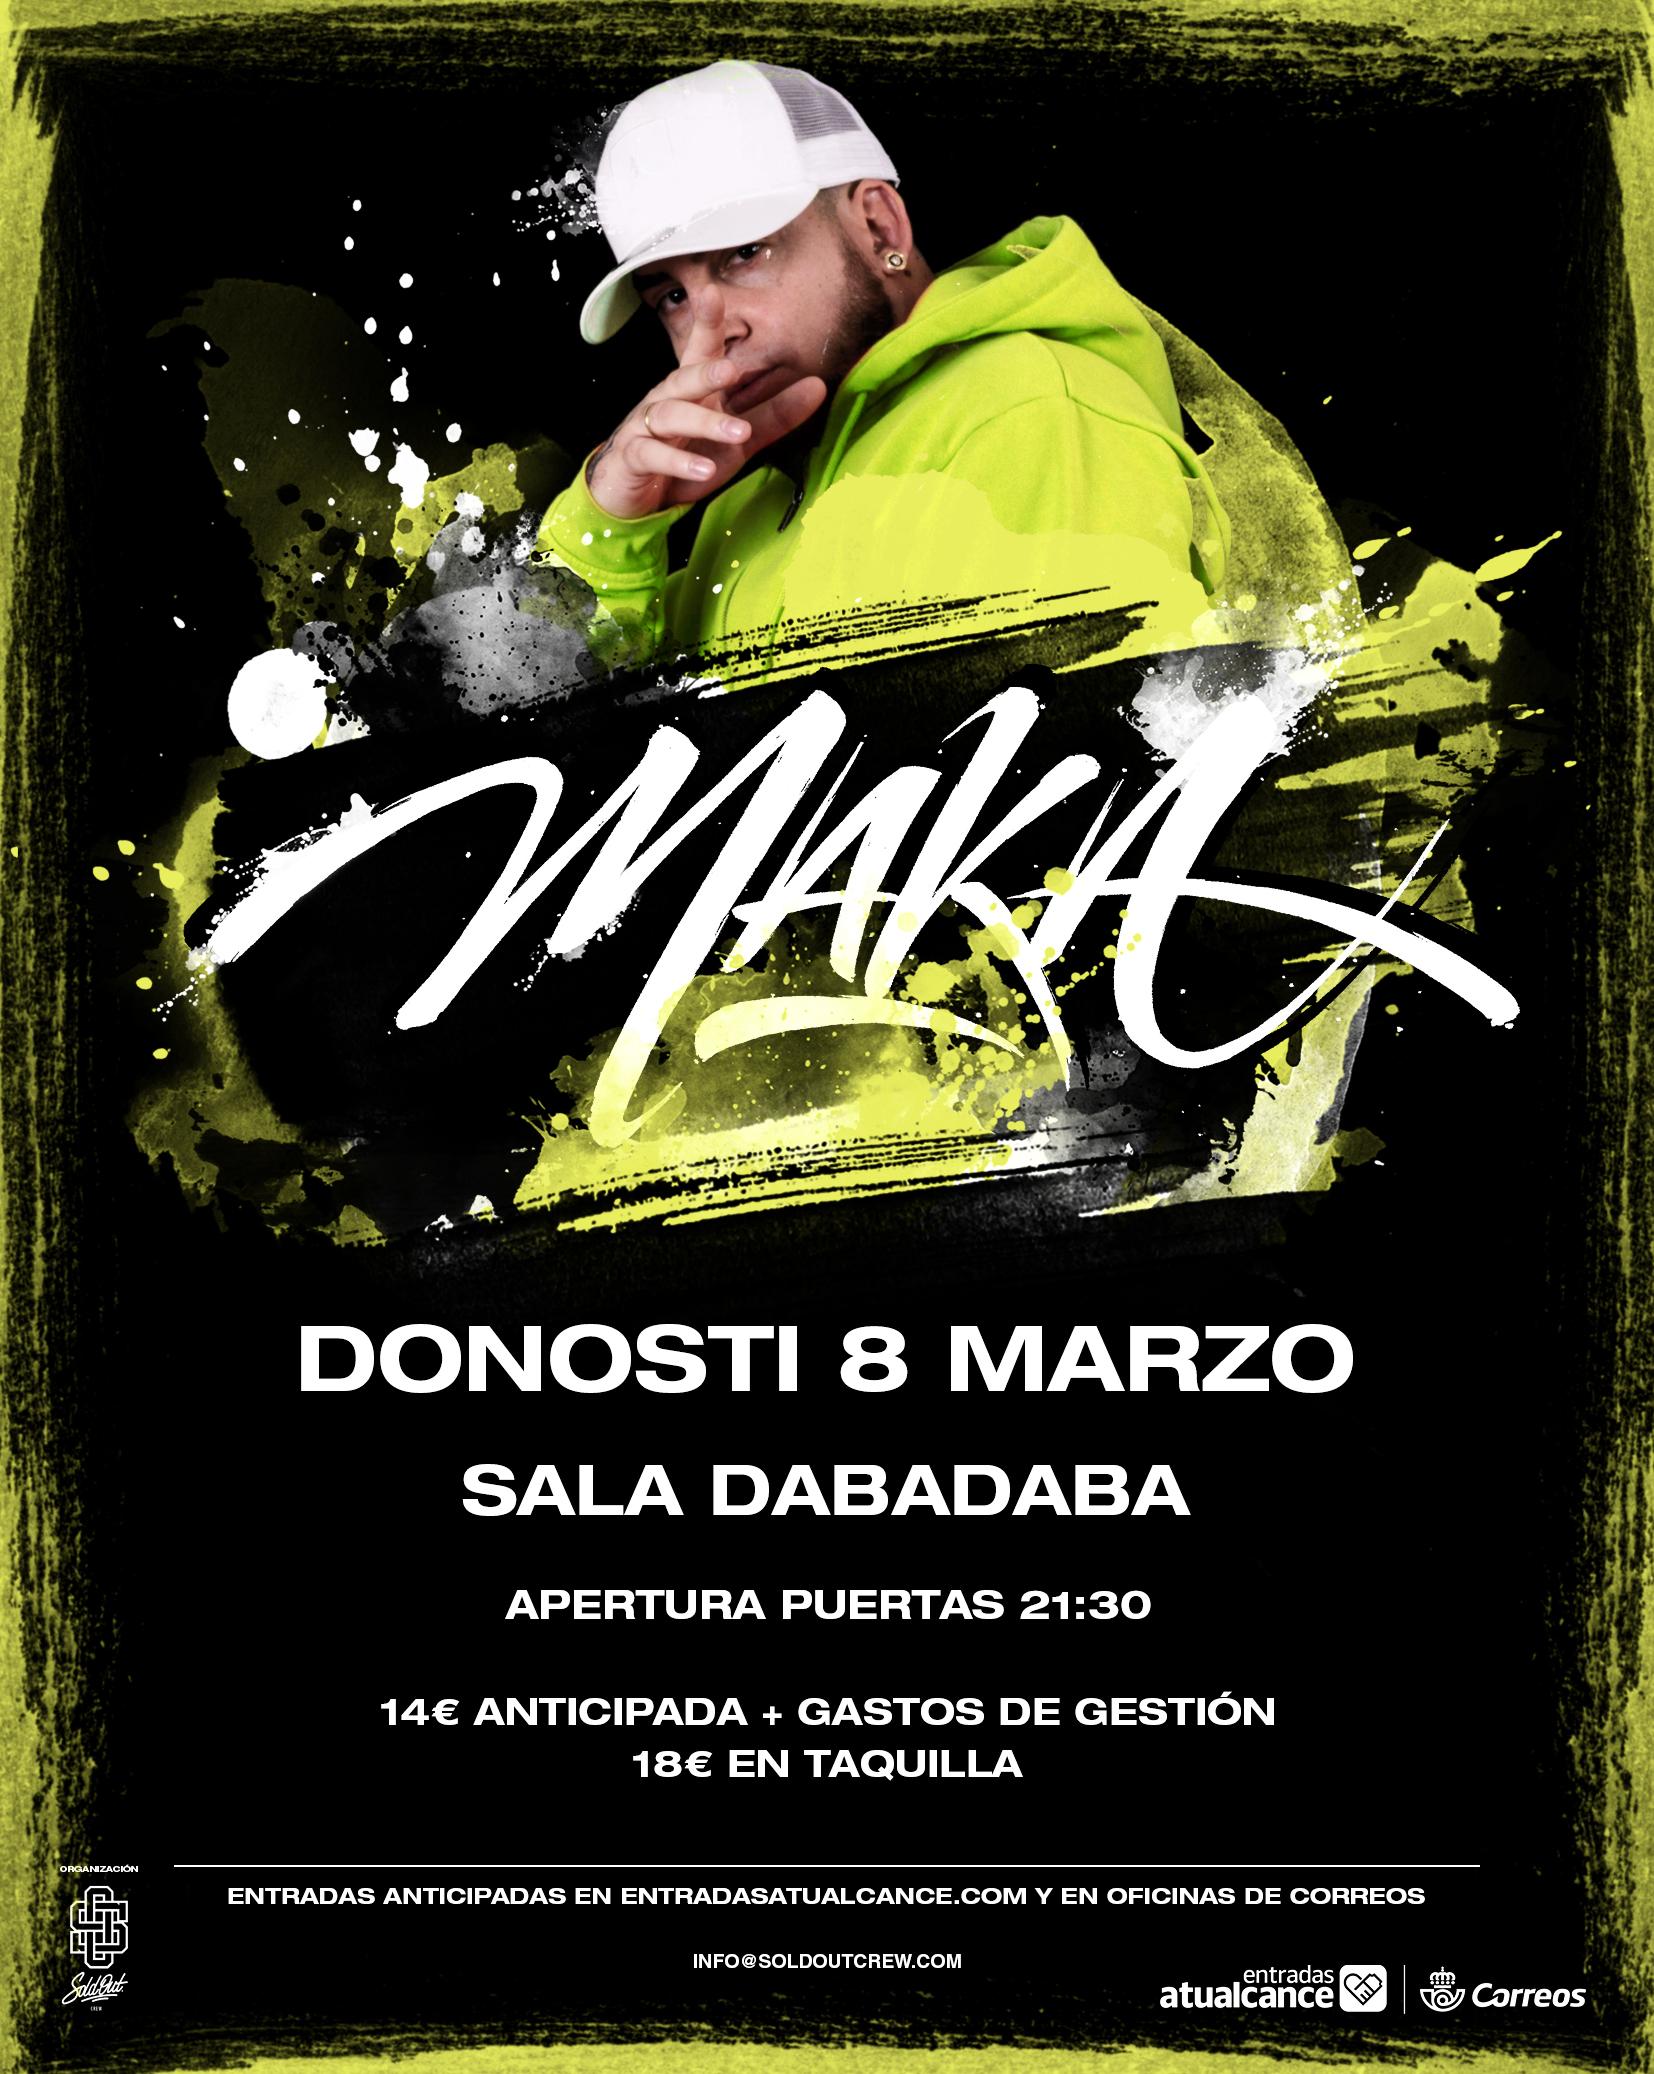 maka-en-sala-dabadaba-donosti-5c50428e54